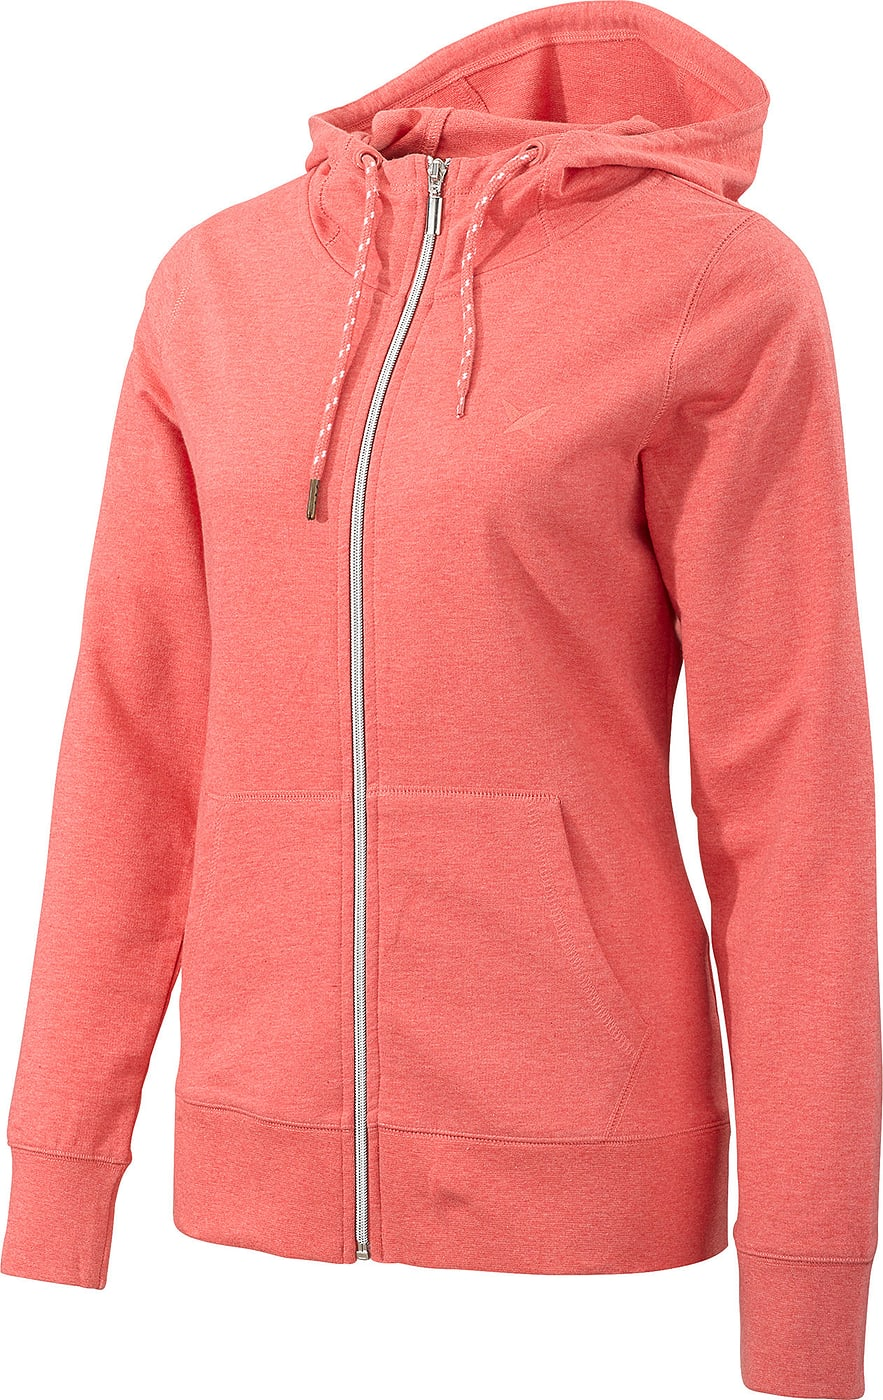 low priced ad498 6c131 Extend Sweatjacket Hood Uma Giacca con cappuccio da donna